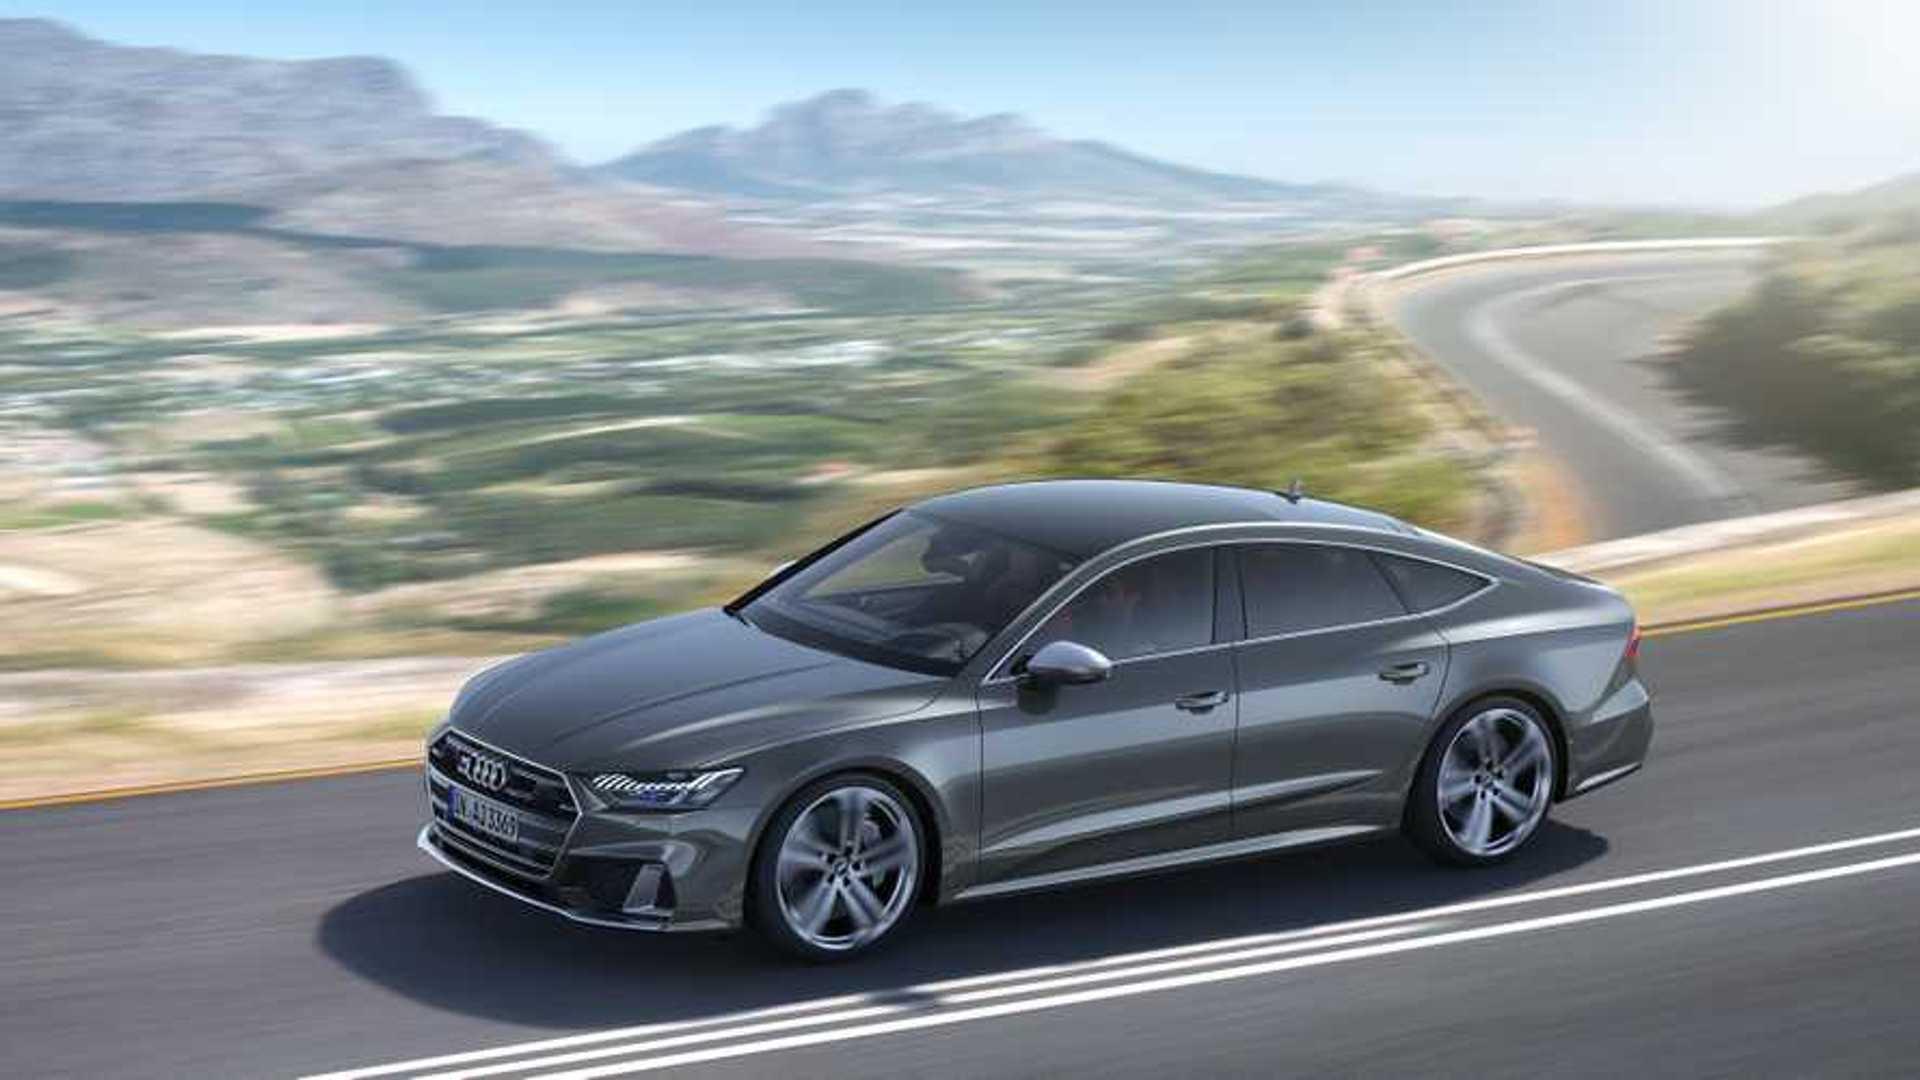 2020 Audi S7 Sportback Costs $10,000 More Than S6 Sedan